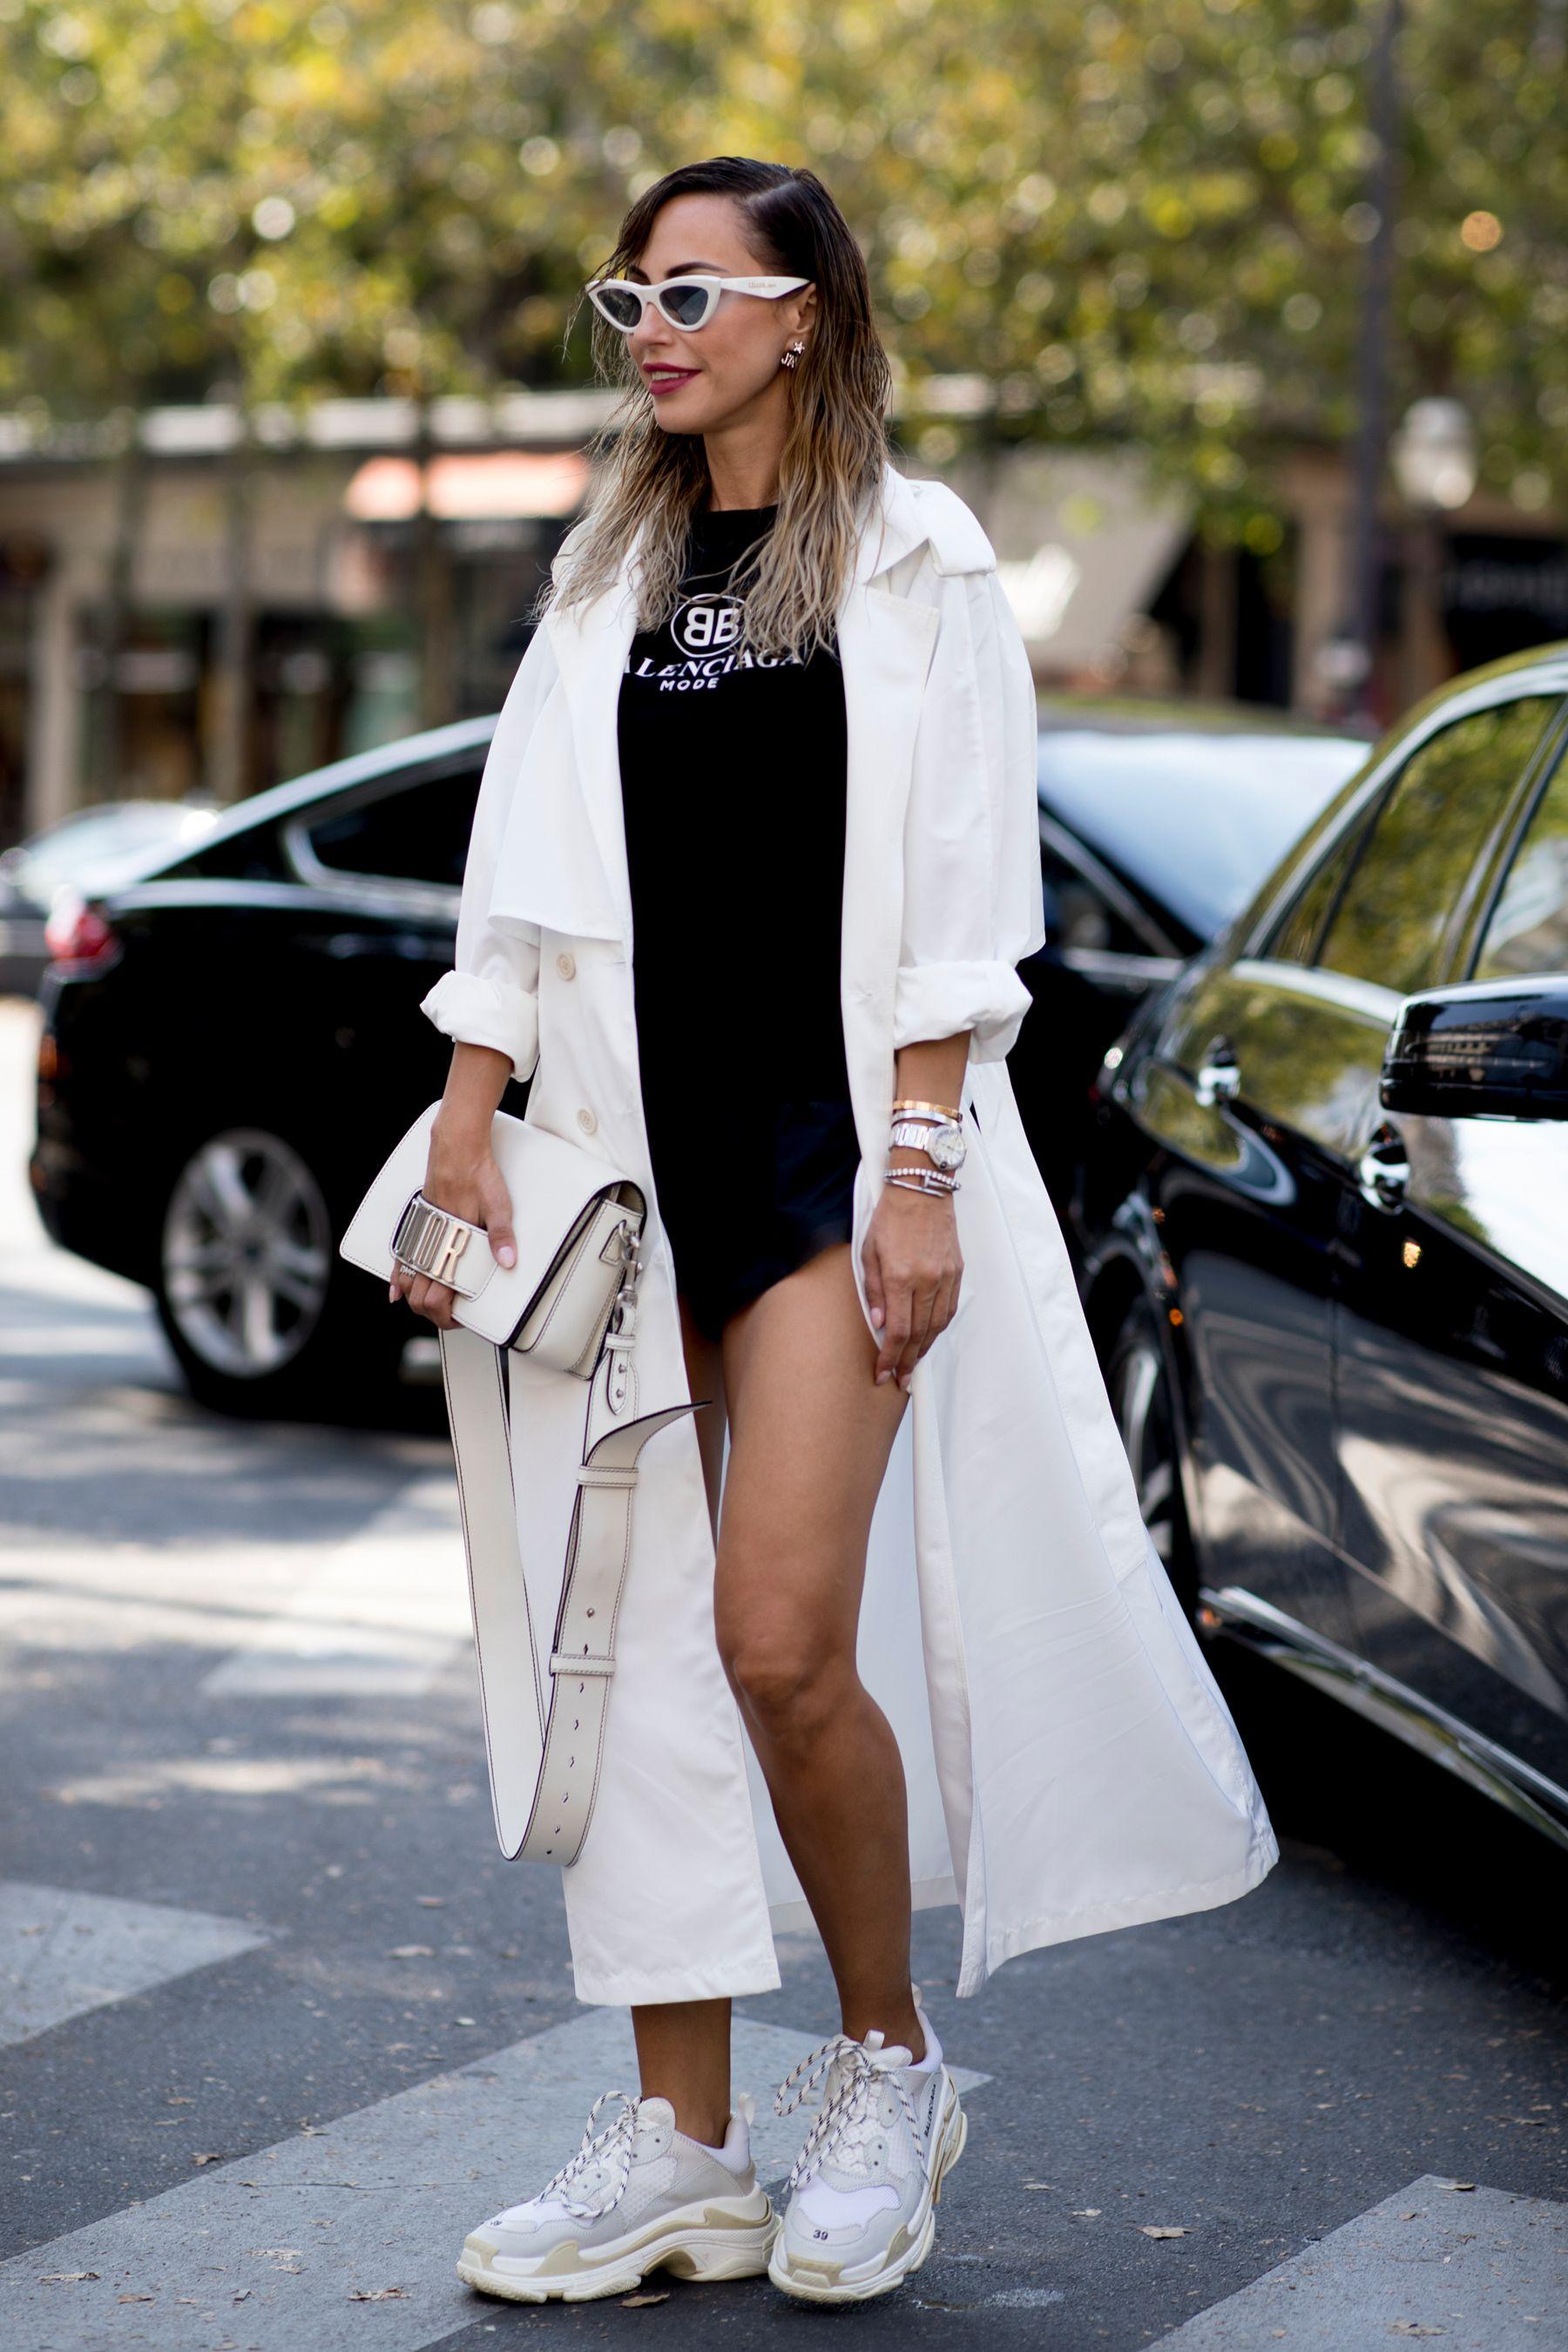 Prendas blancas de armario de verano Looks con prendas blancas